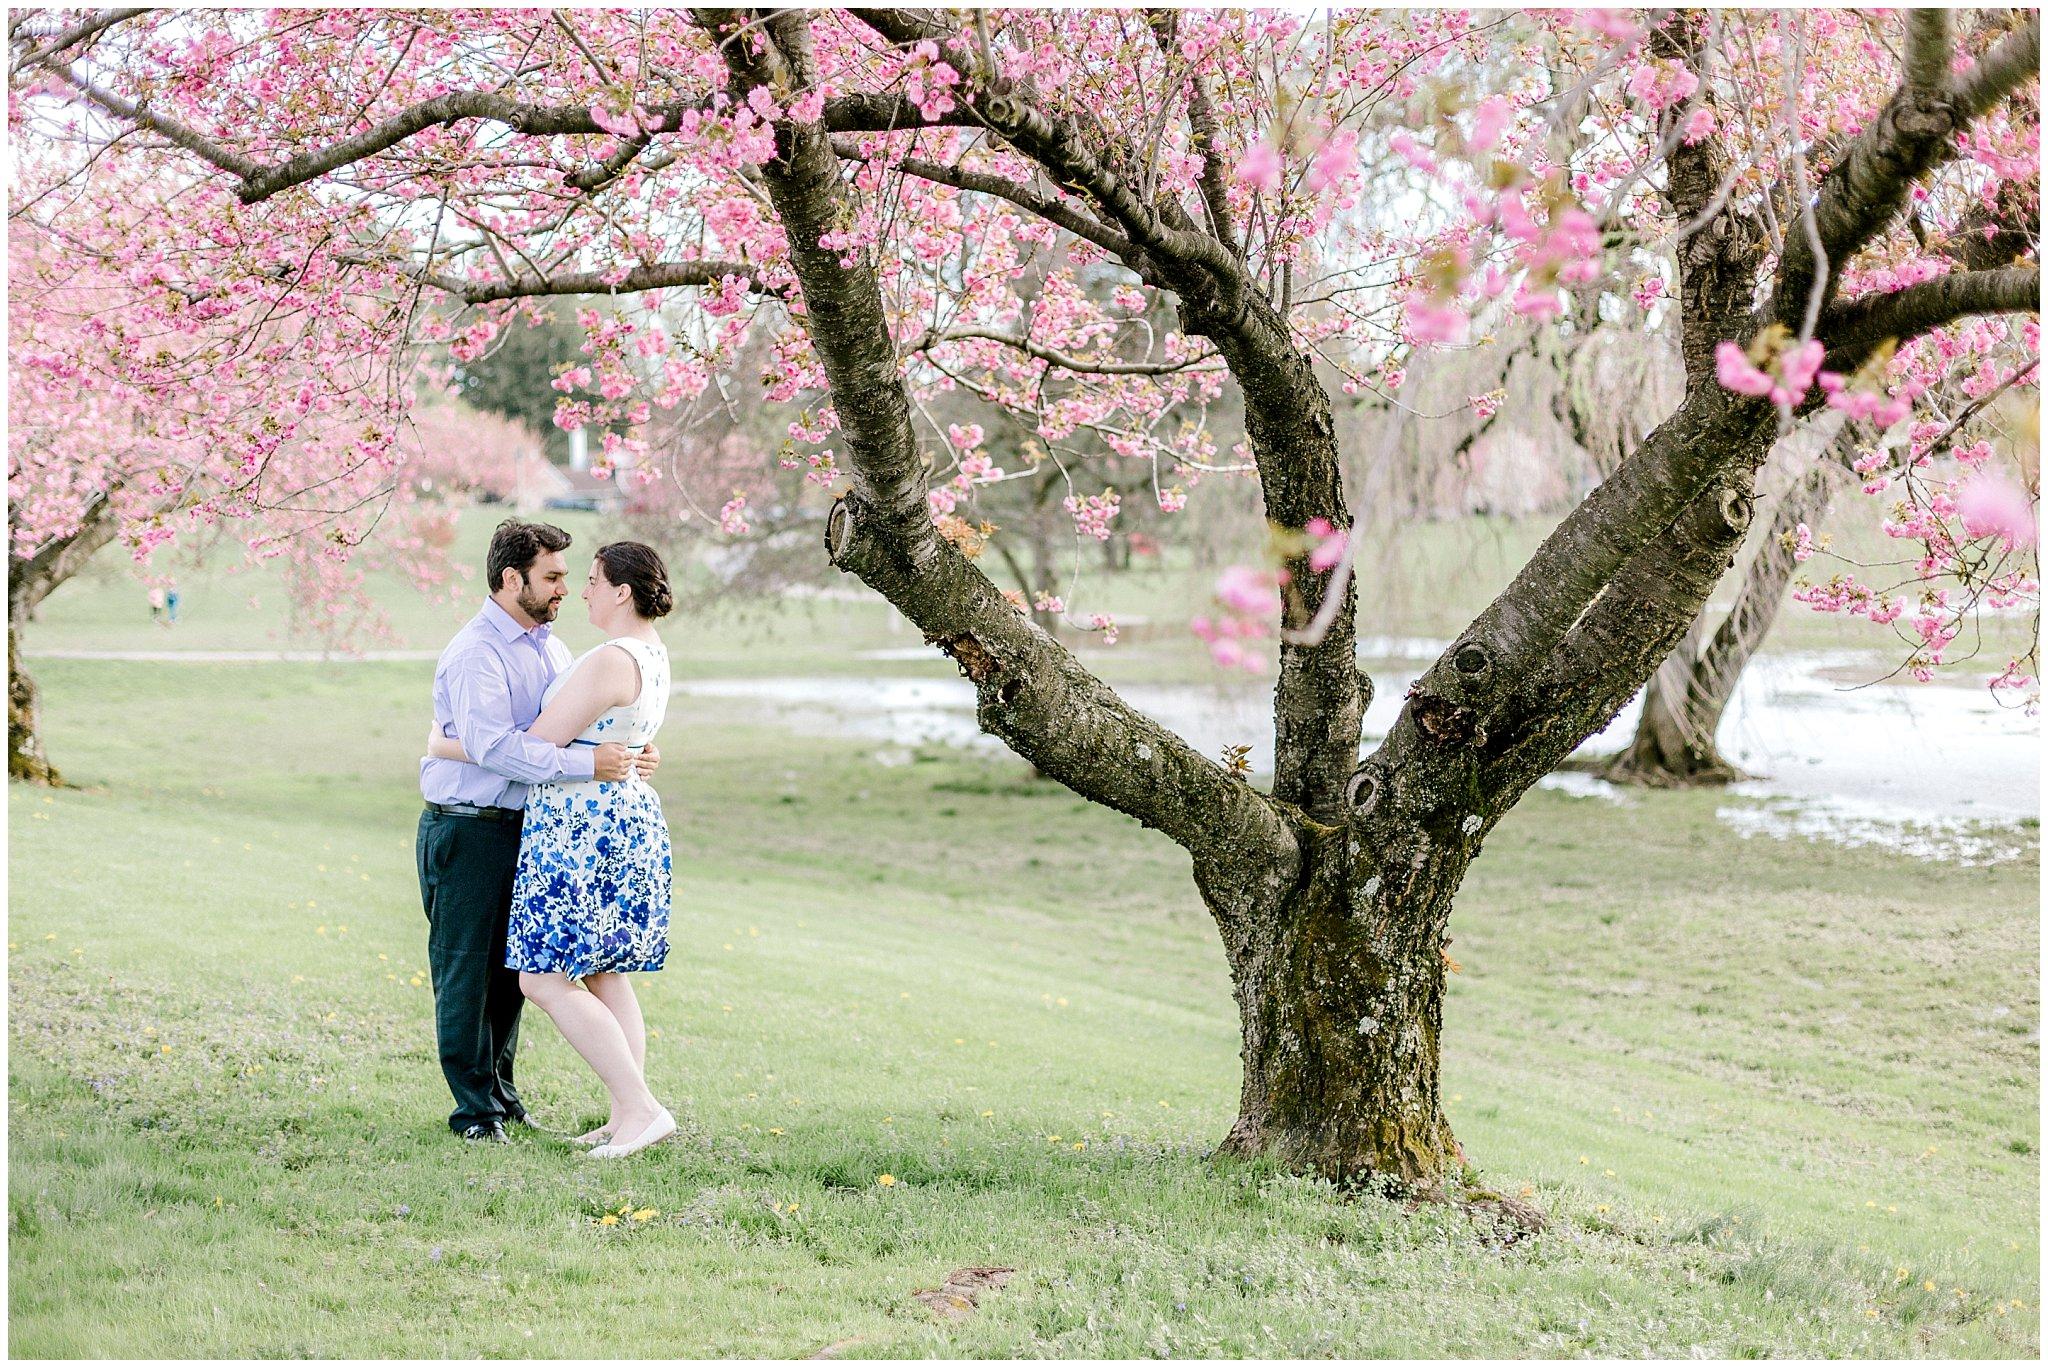 Lehigh Valley Spring Cherry Blossom Engagement Session Pennsylvania Wedding Photographer (2).jpg